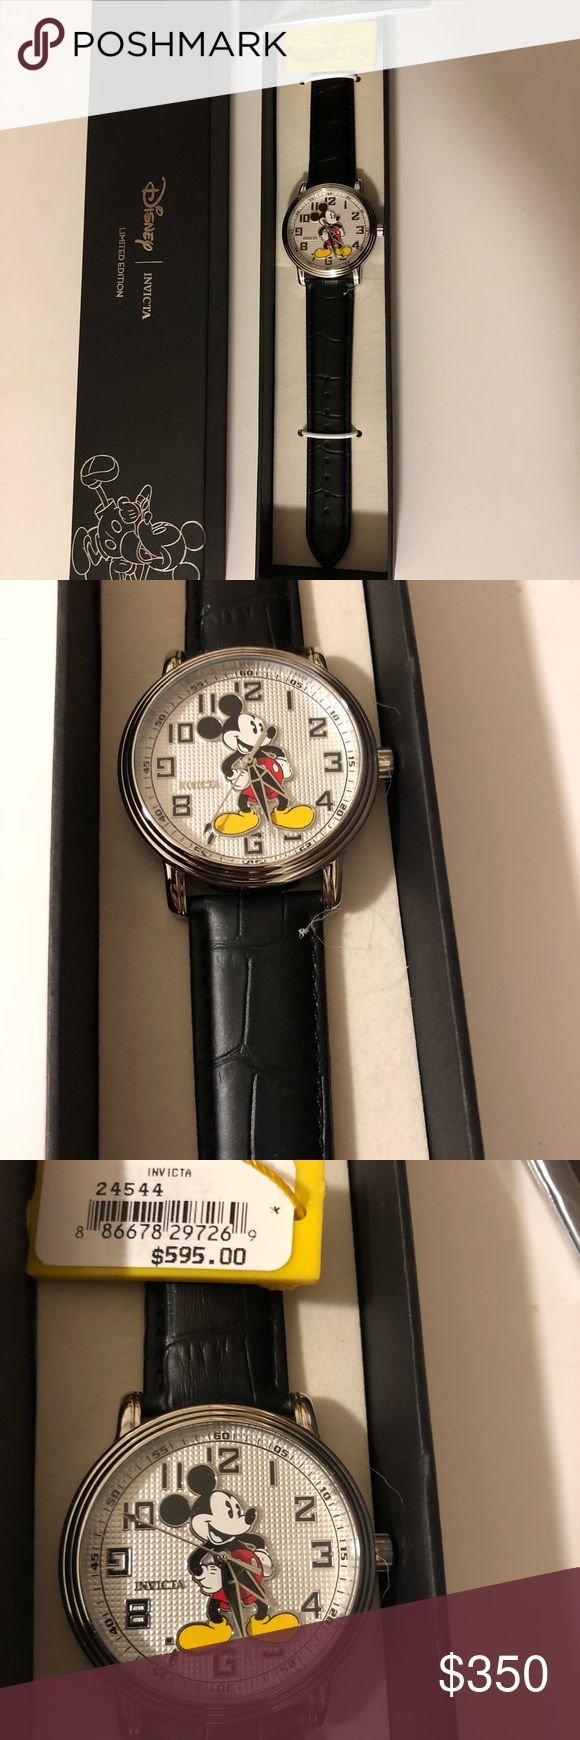 New Men's Invicta Limited Edition Watch New Men's Invicta Limited Edition Disney Watch. Leather Band. Orig. $595 Invicta Accessories Watches